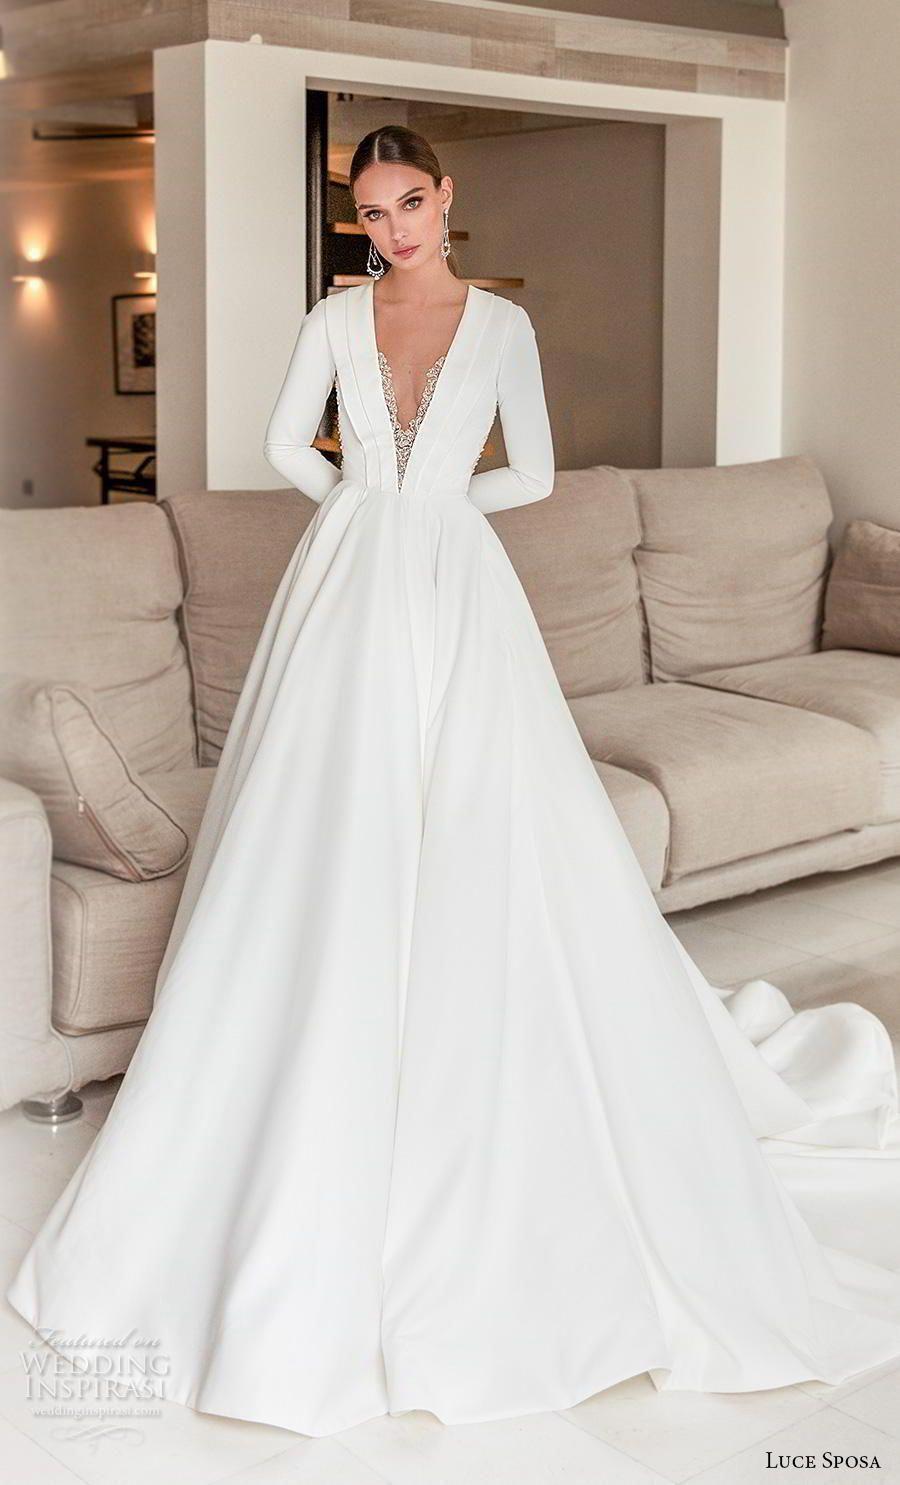 Luce Sposa 2020 Bridal Long Sleeves Deep V Neck Simple Minimalist Elegant Modern A Line Wedding Dress Keyho Wedding Dresses Bridal Dresses Wedding Dress Guide,Wedding Bridal Dresses Hd